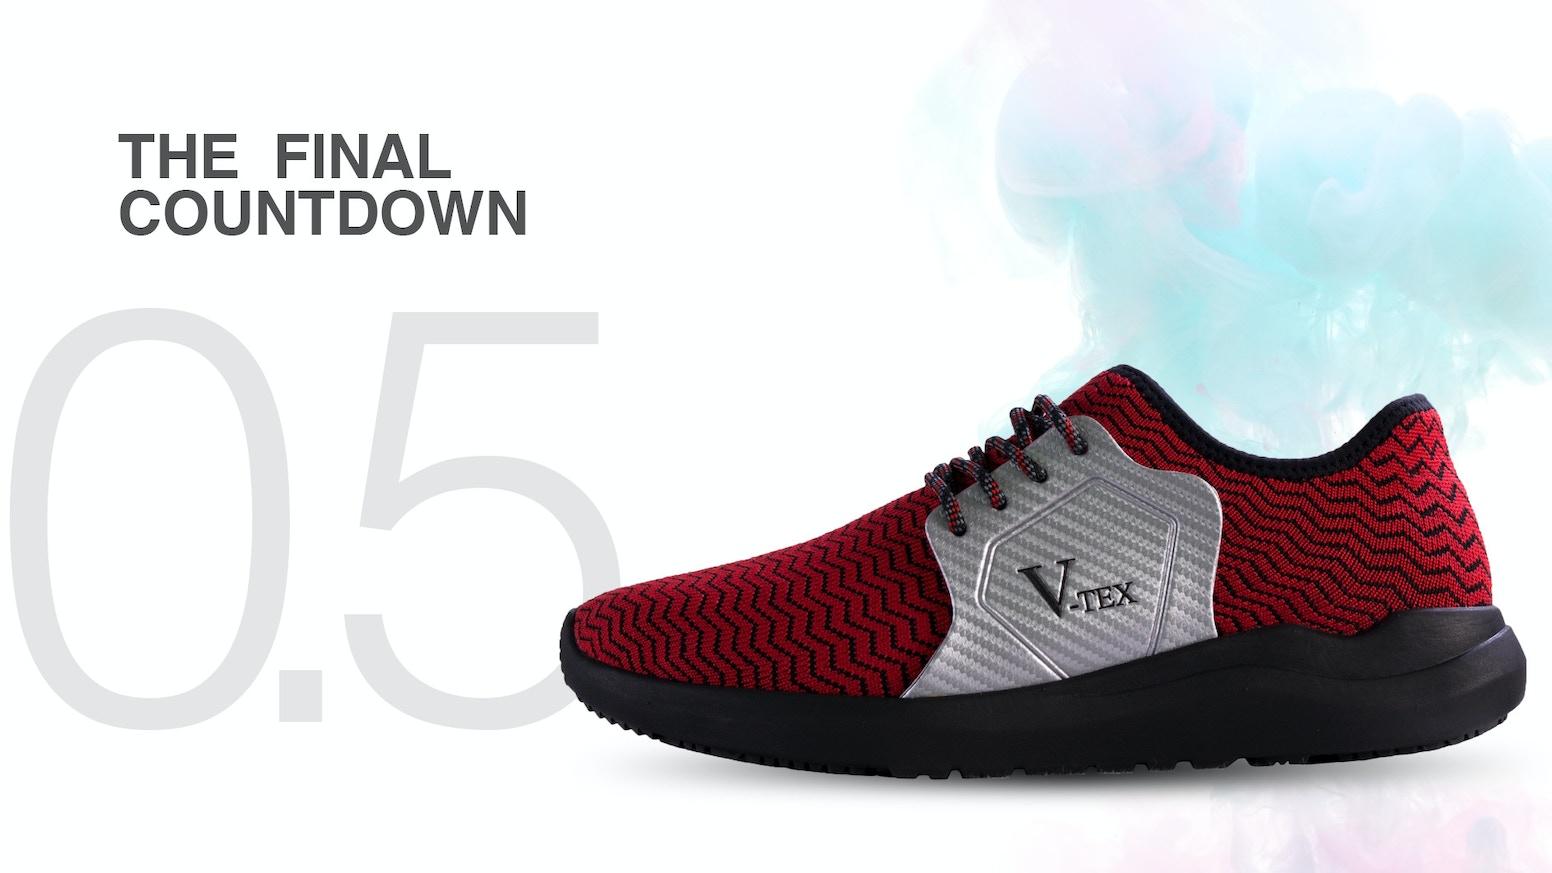 b1a2f78ba69 V-TEX: The Ultimate 100%Waterproof Vegan Nanotech Knit Shoes by 360 ...